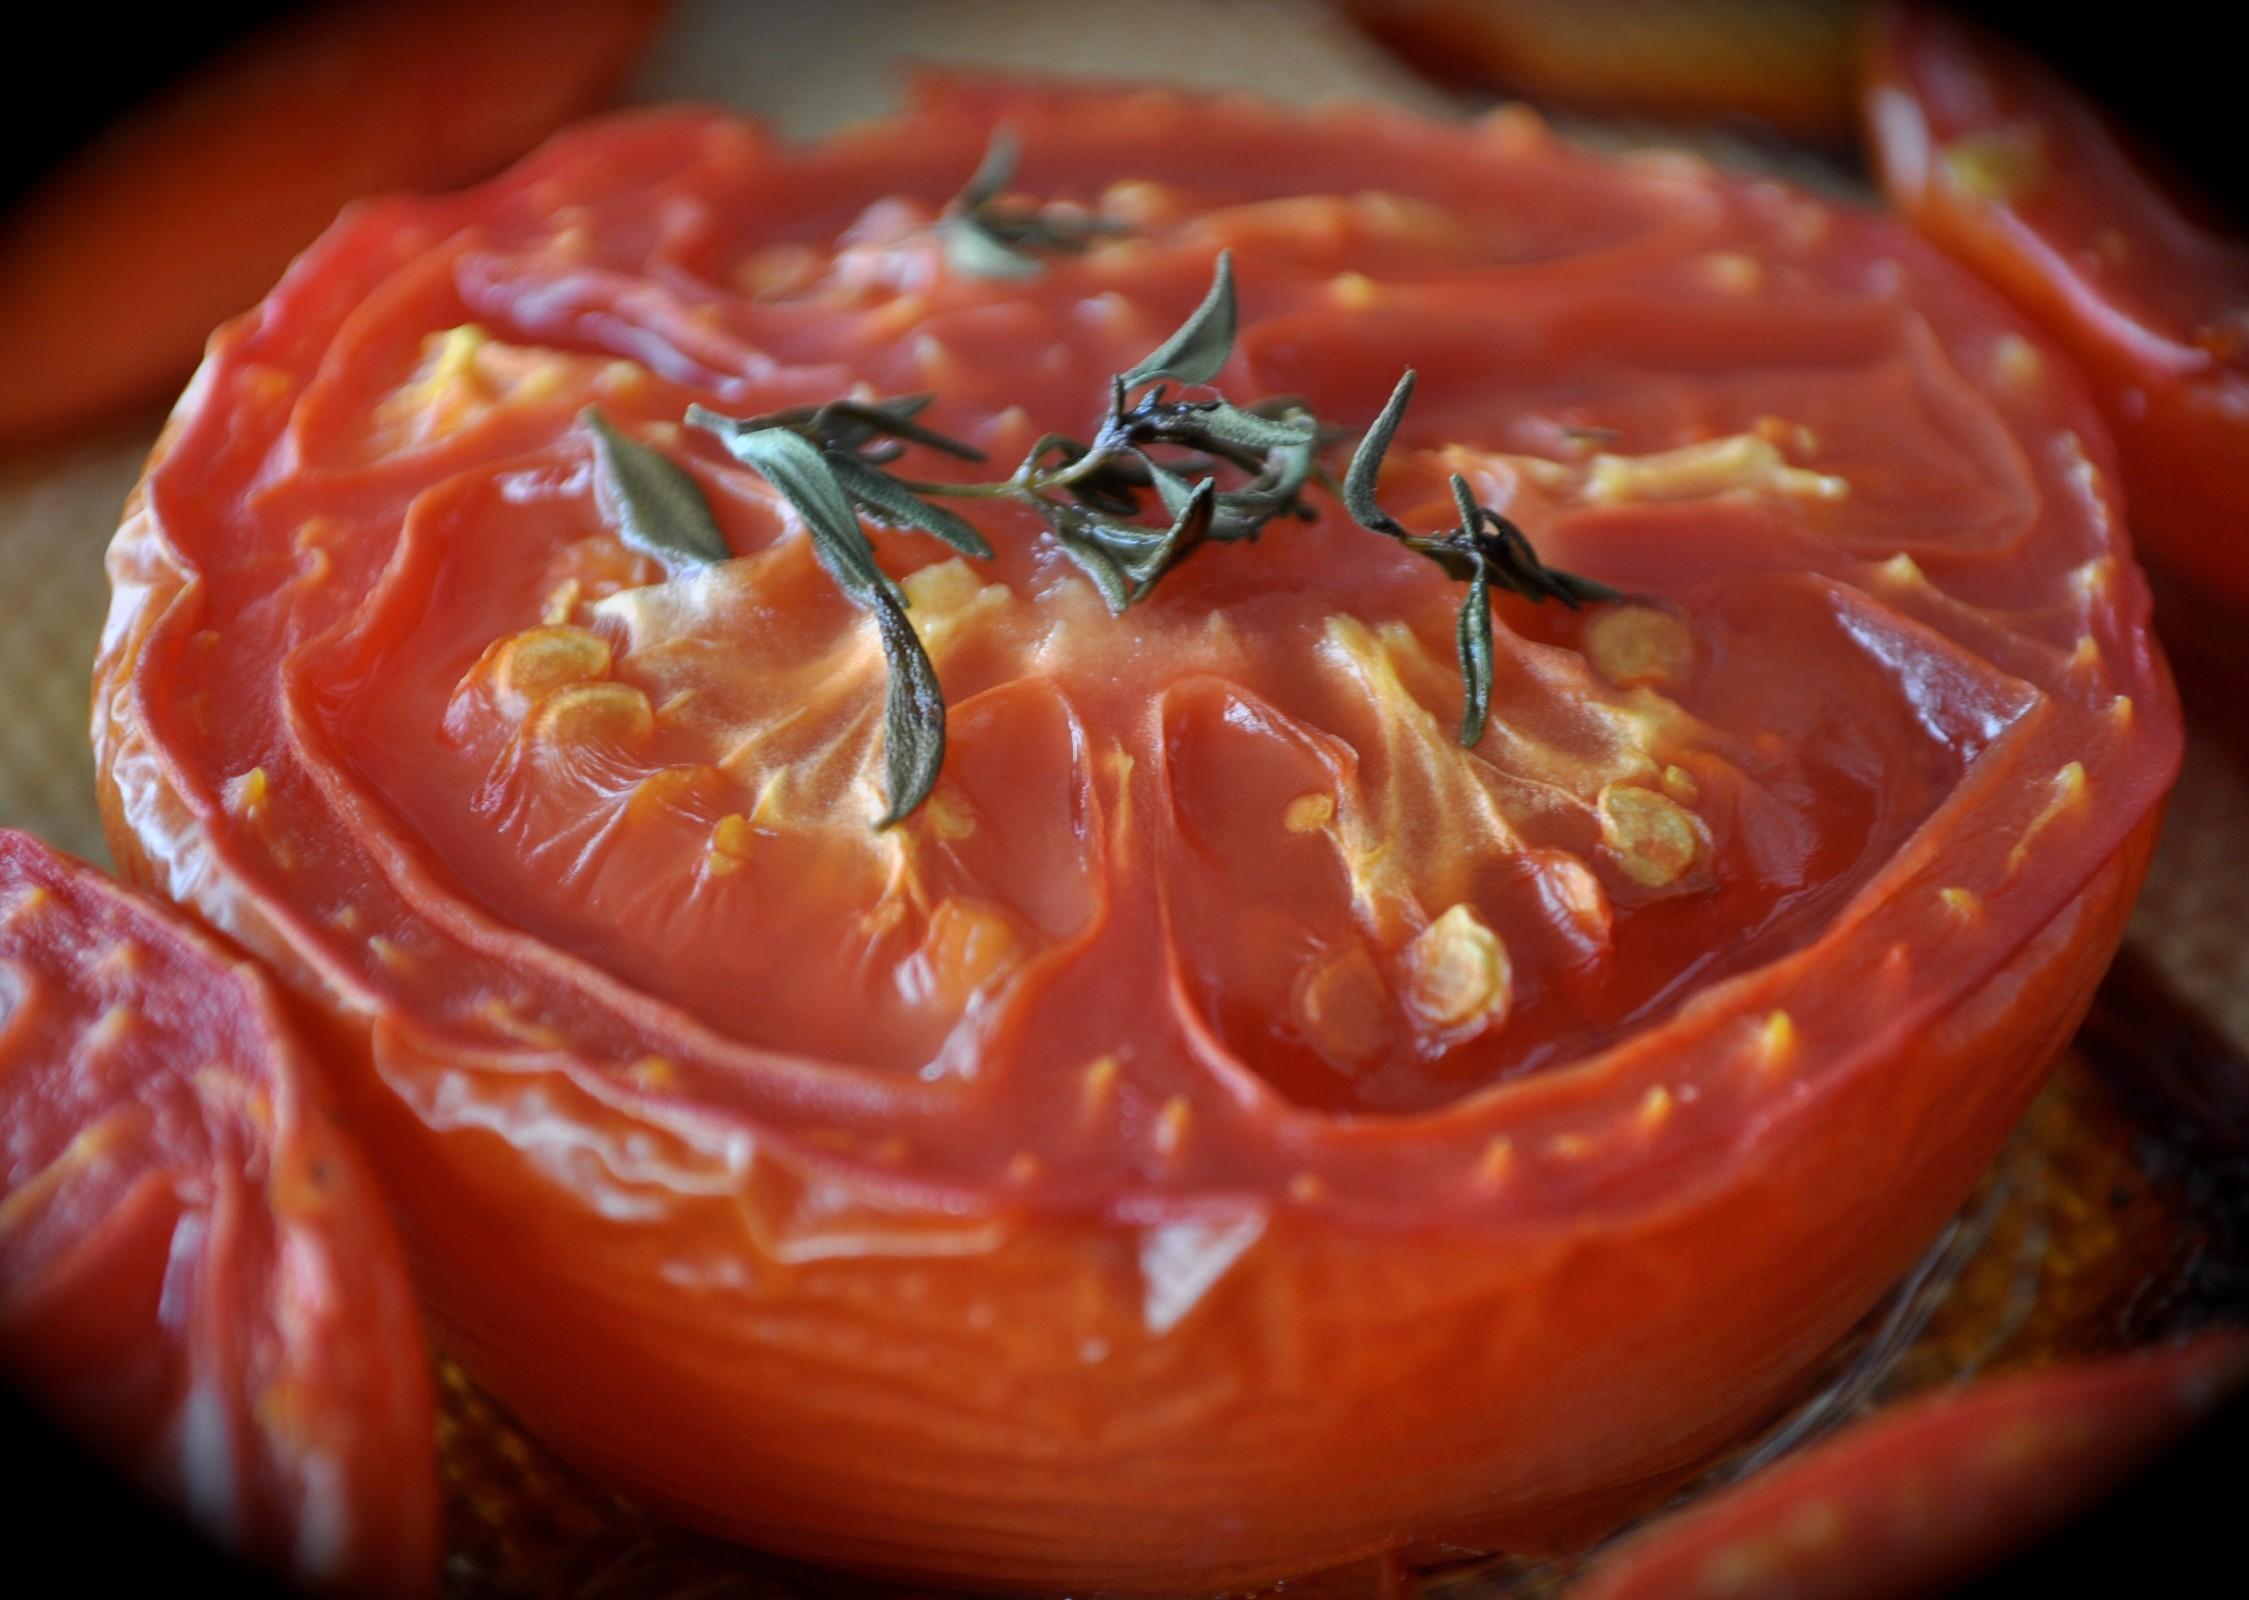 Roasting tomatoes - PHOTO BY SIMONA CARINI